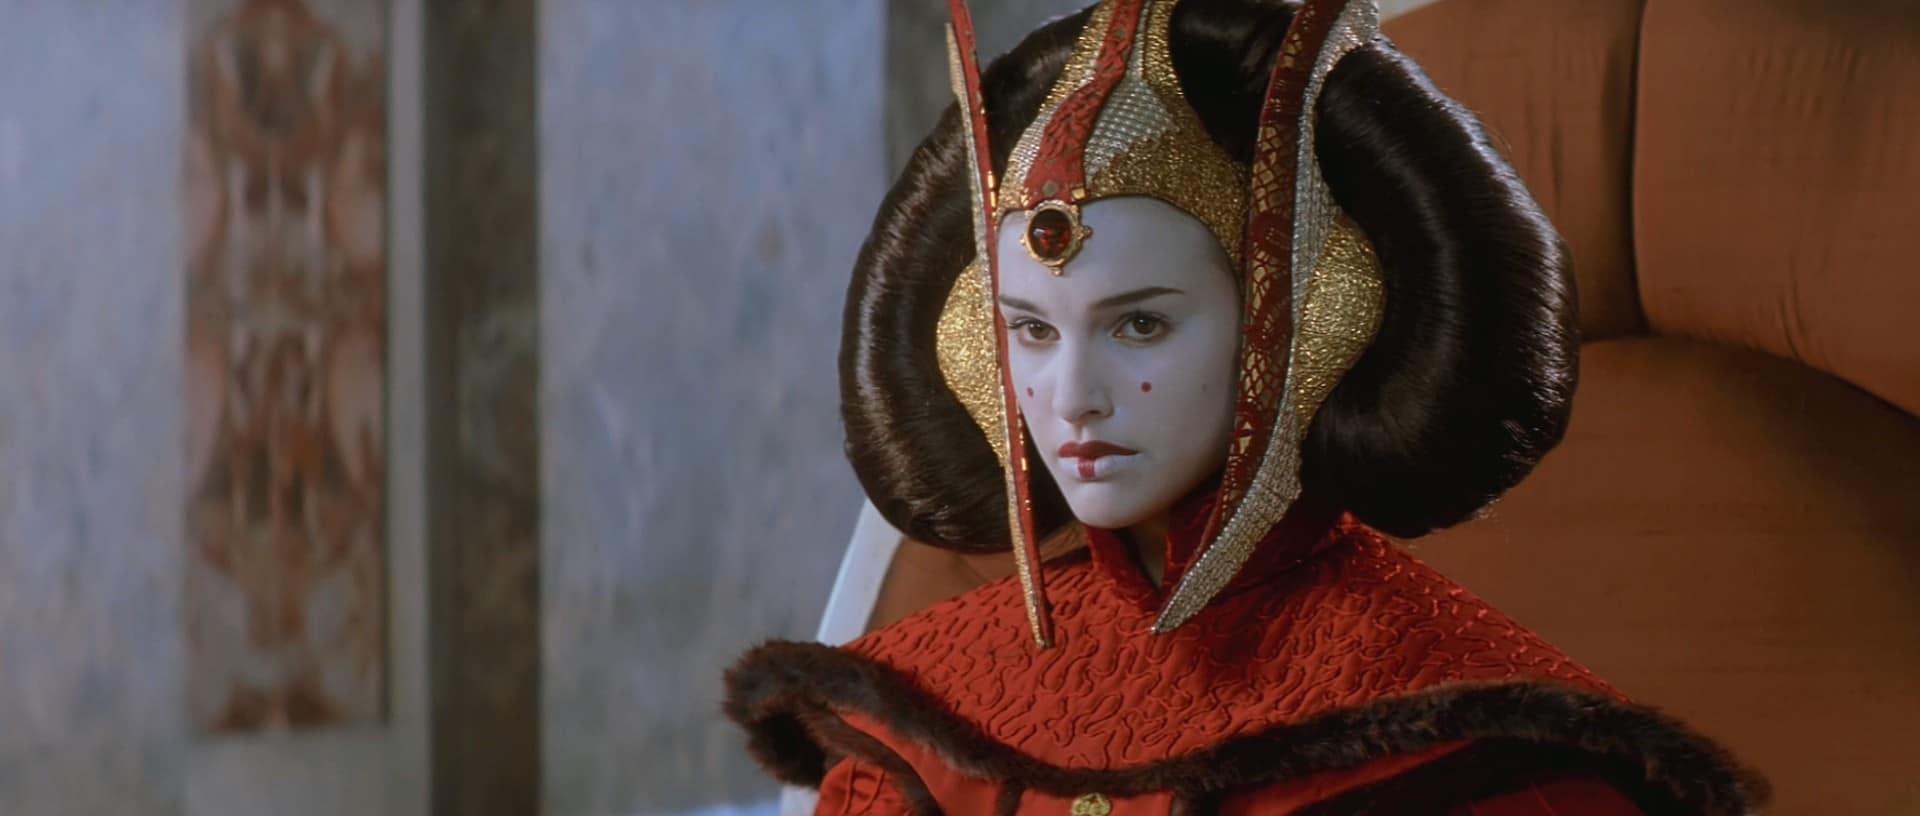 Natalie Portman dans Star Wars